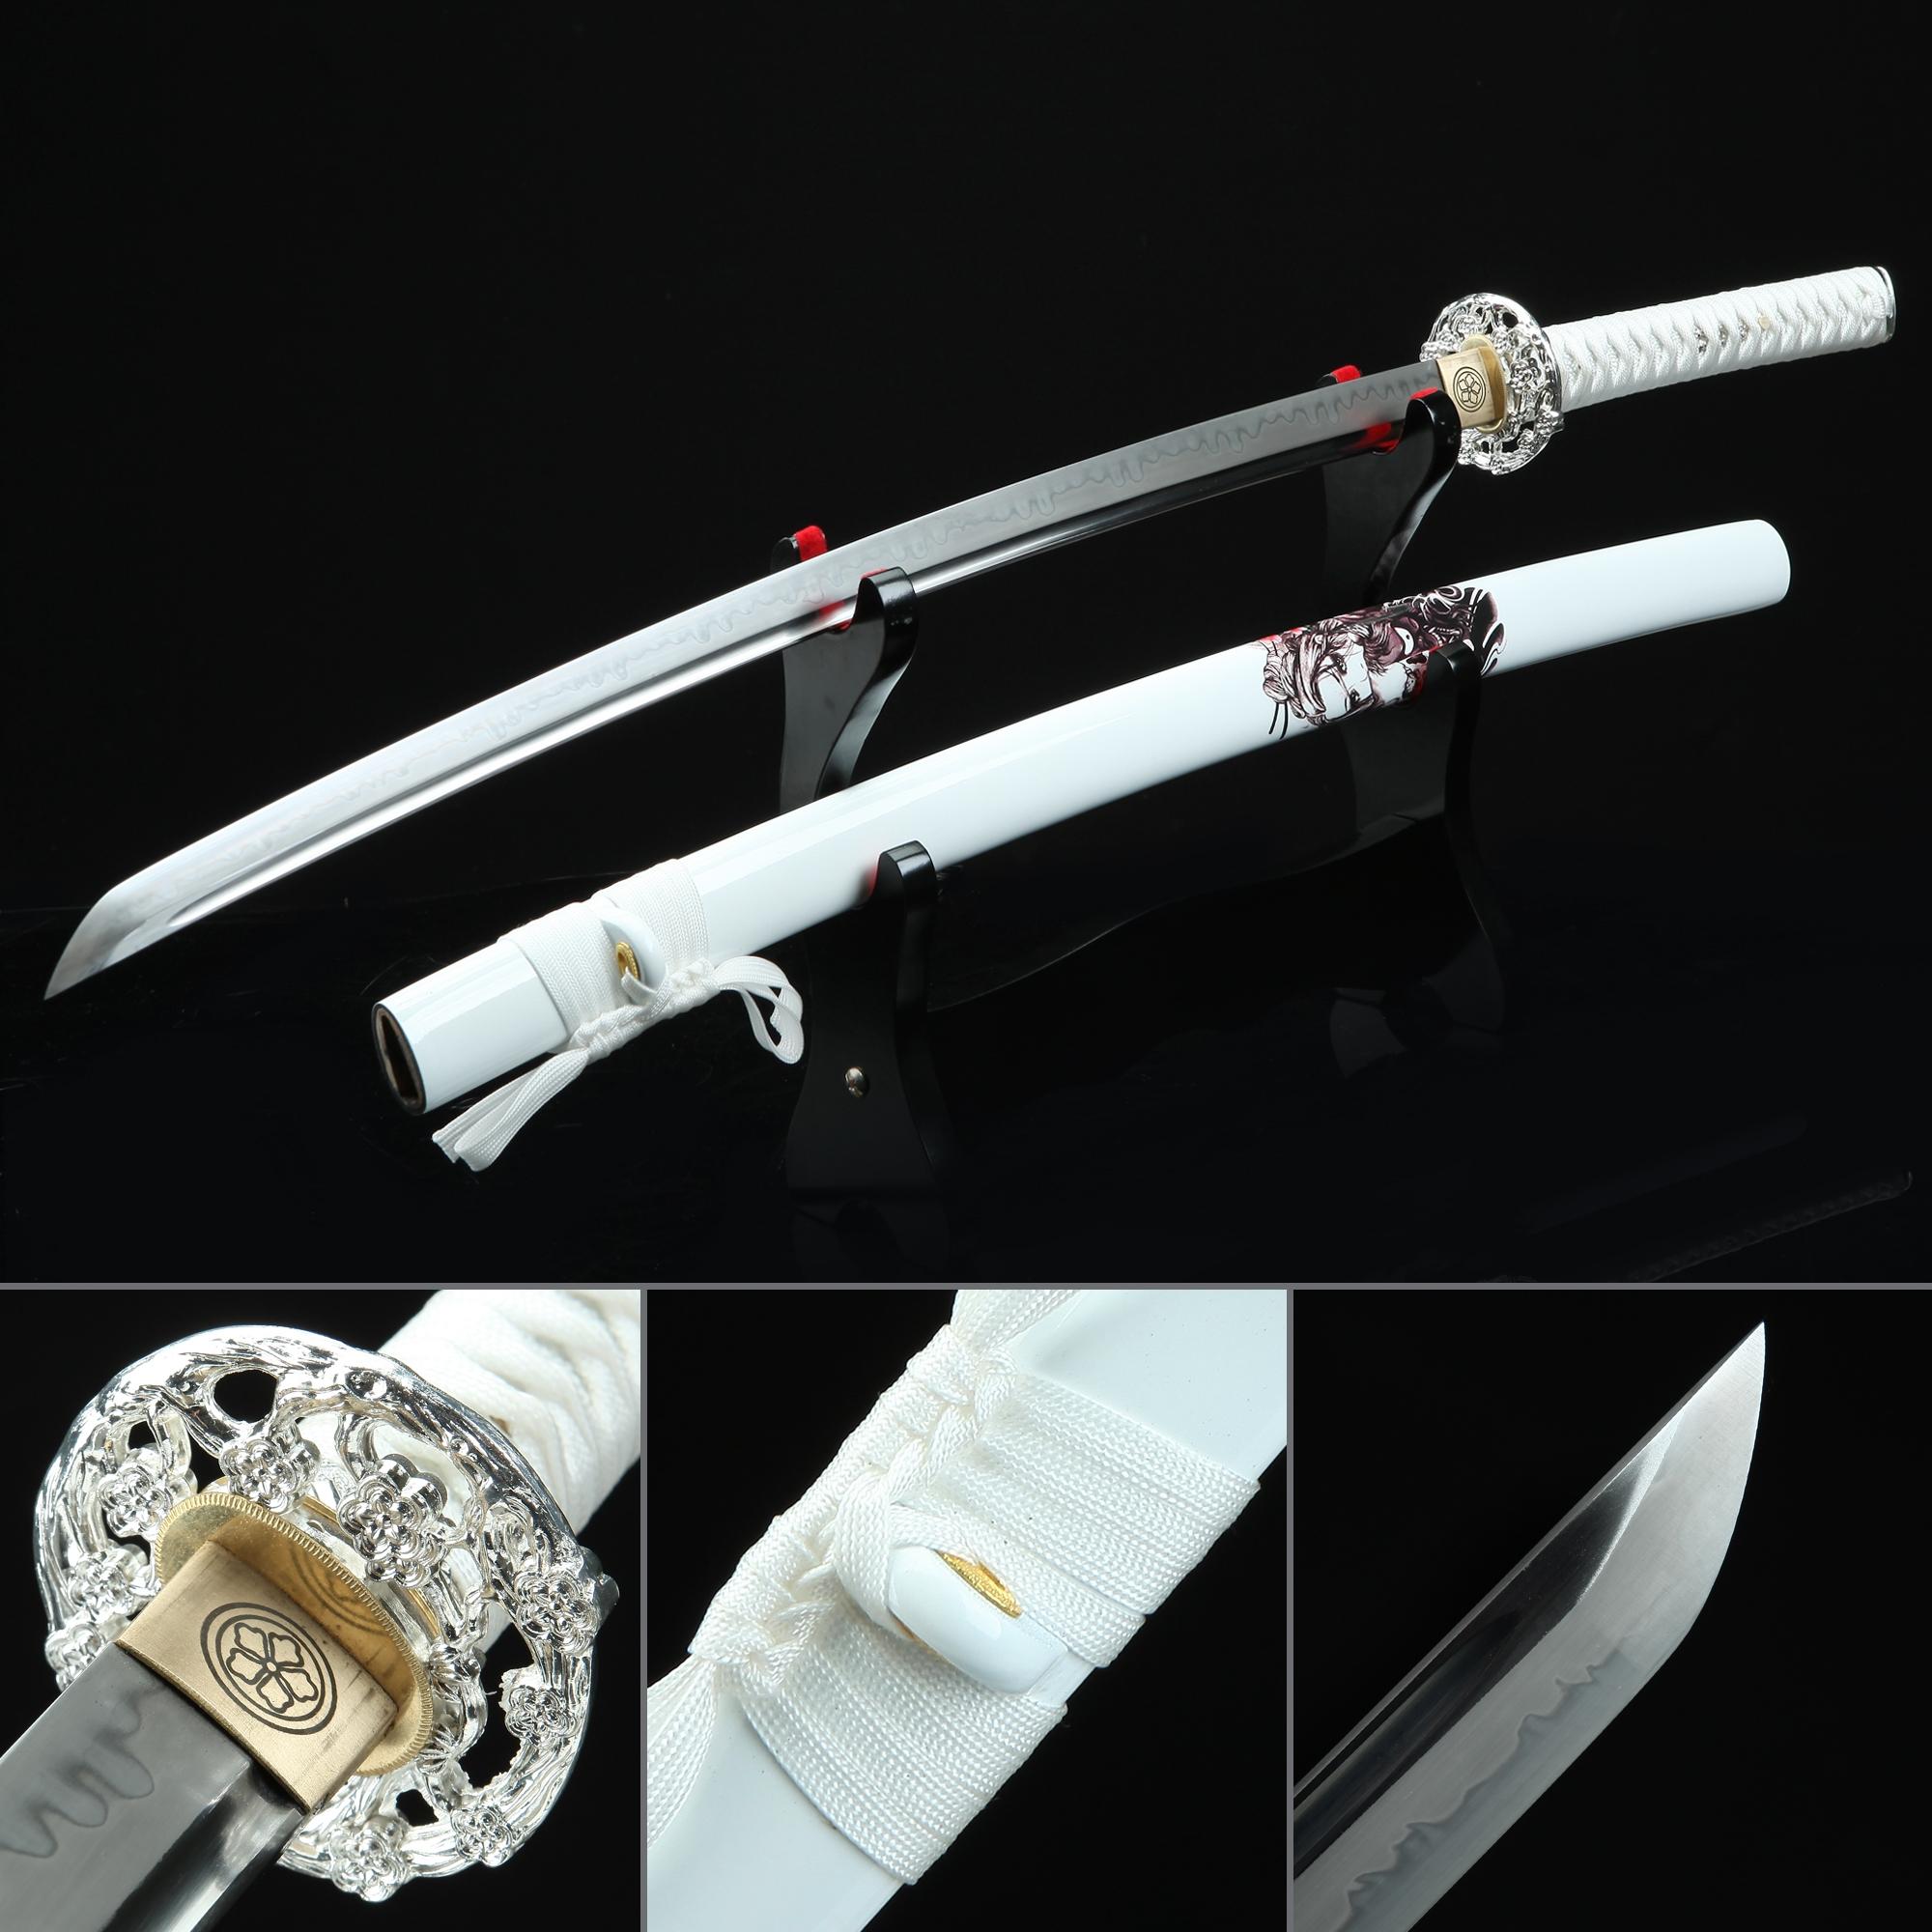 White Katana, Real Hamon Japanese Katana Sword T10 Folded Clay Tempered Steel With White Scabbard